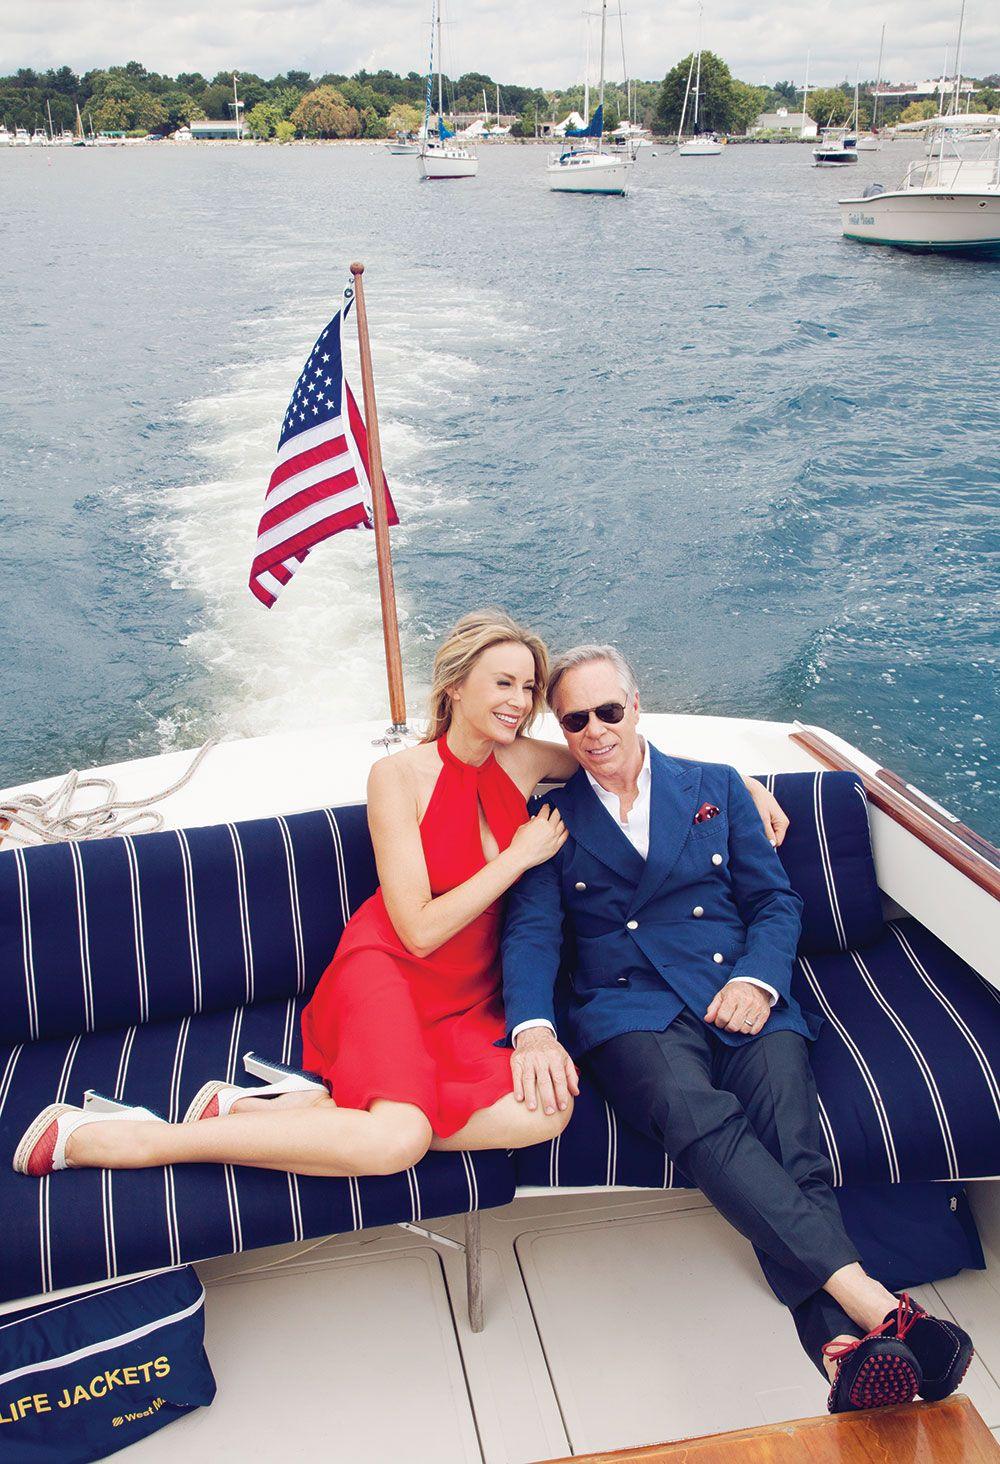 BestofYachtng #Fashion Dee and Tommy Hilfiger - AJ MacDonald - Yacht Broker  - ajmacdonald@camperandnicholsons.com | Tommy hilfiger, Tommy, Lady luxury  designs